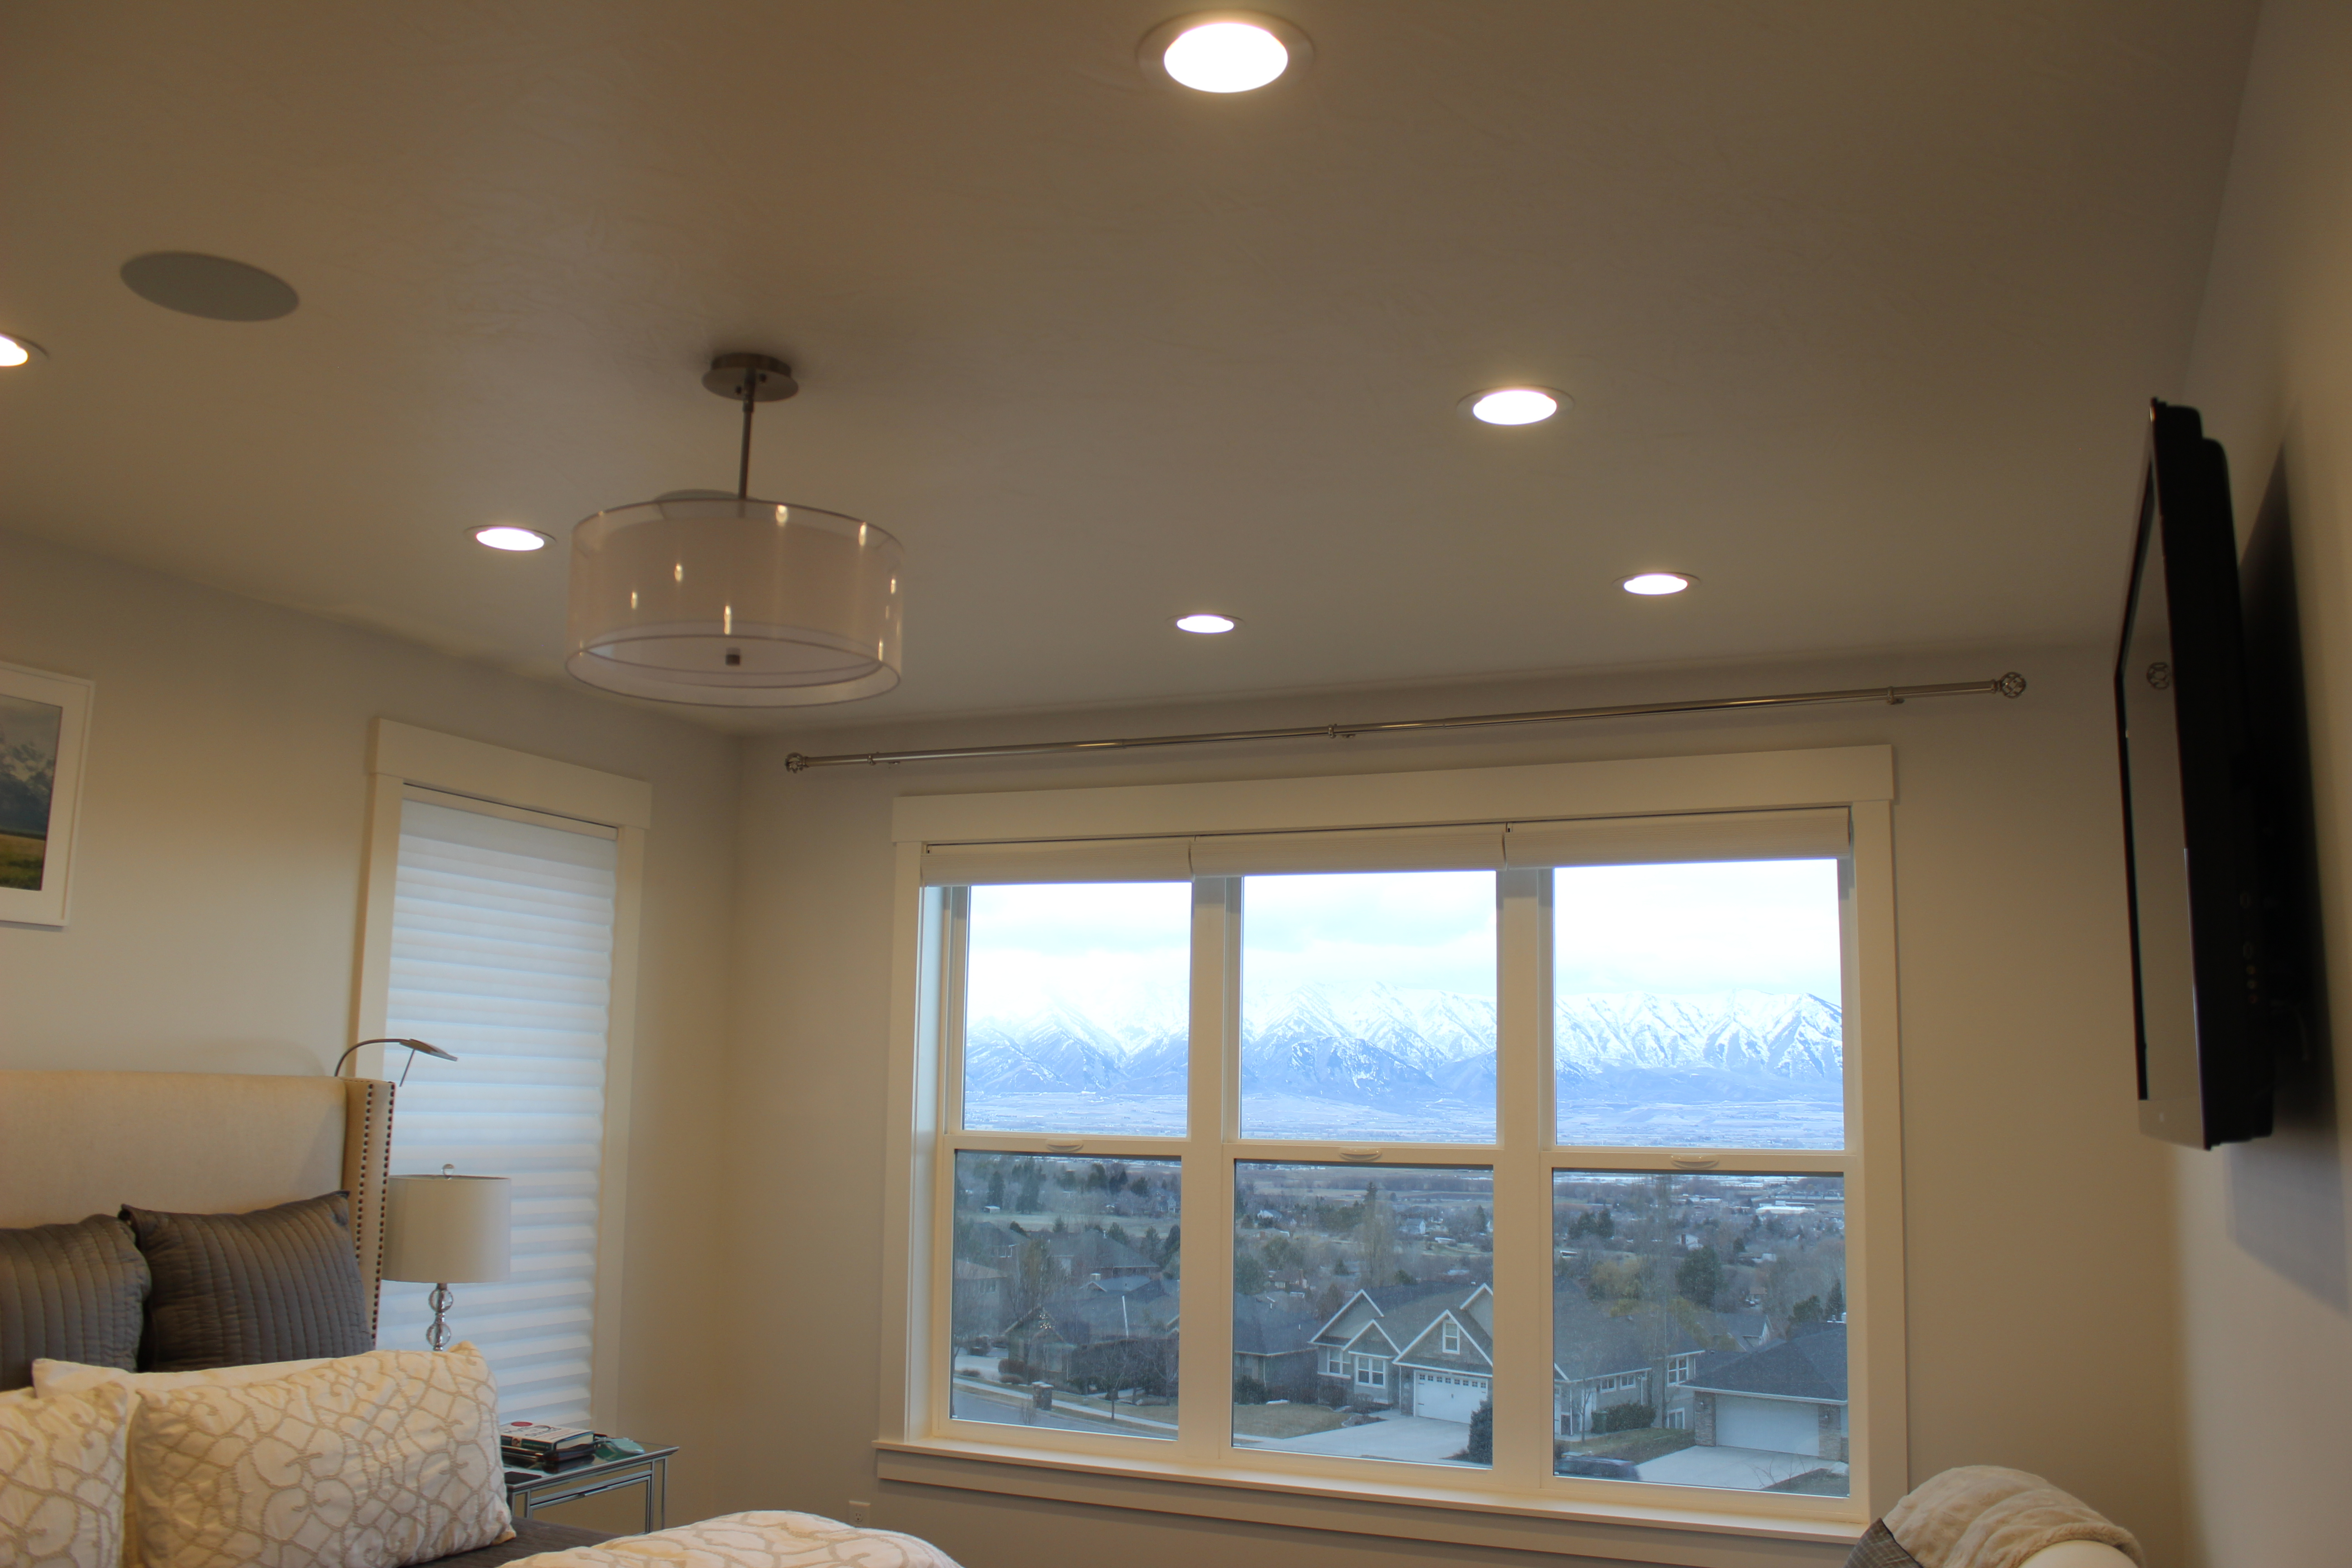 Innovative Lighting & Electrical image 5